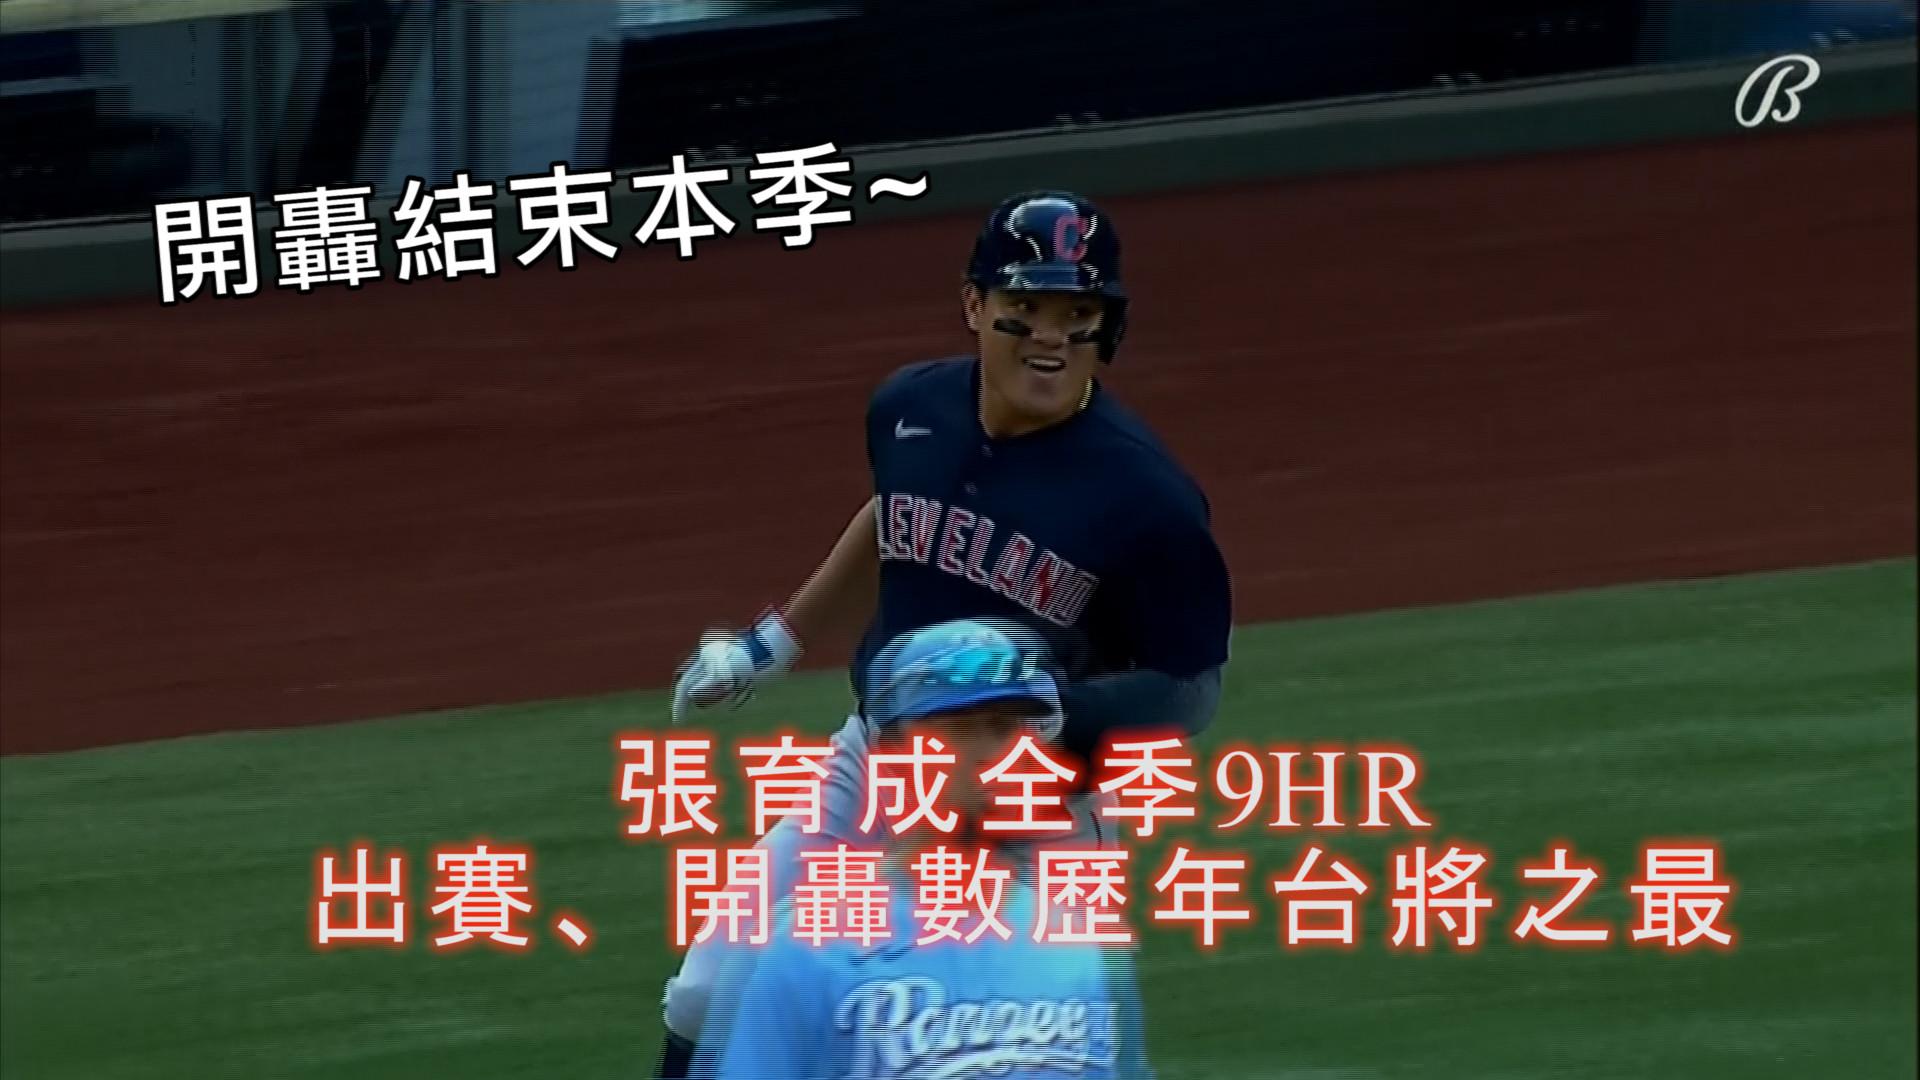 【MLB看愛爾達】張育成最終戰再轟 本季秀強大潛力 10/4